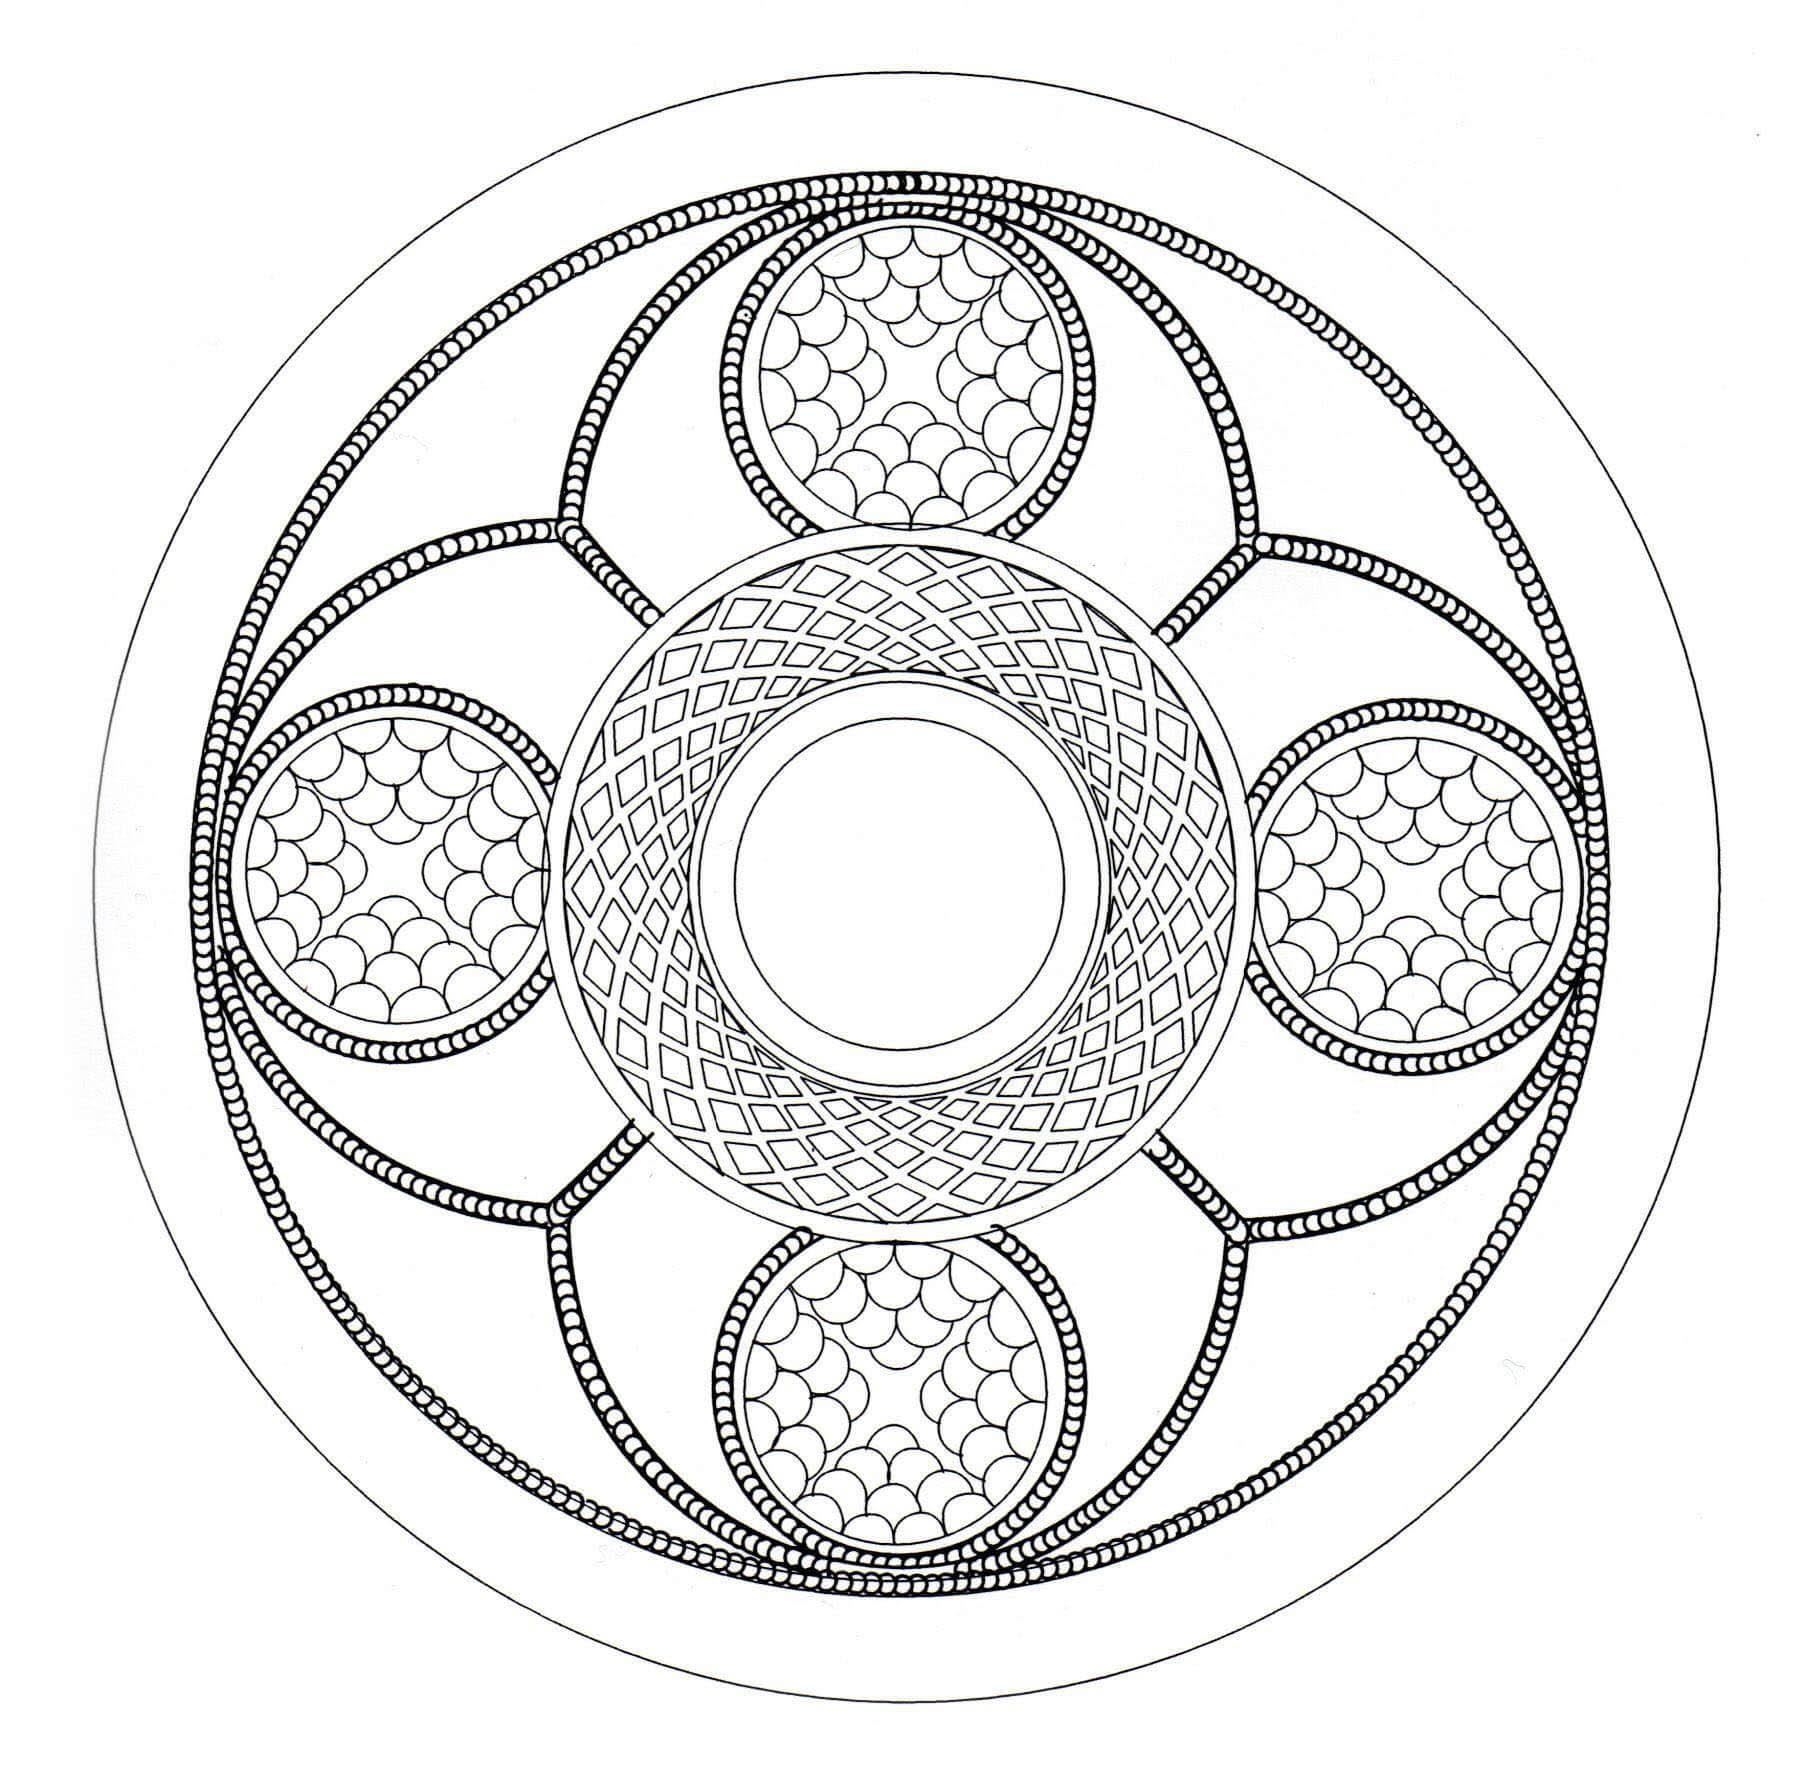 Celtic art design looking like a Mandala